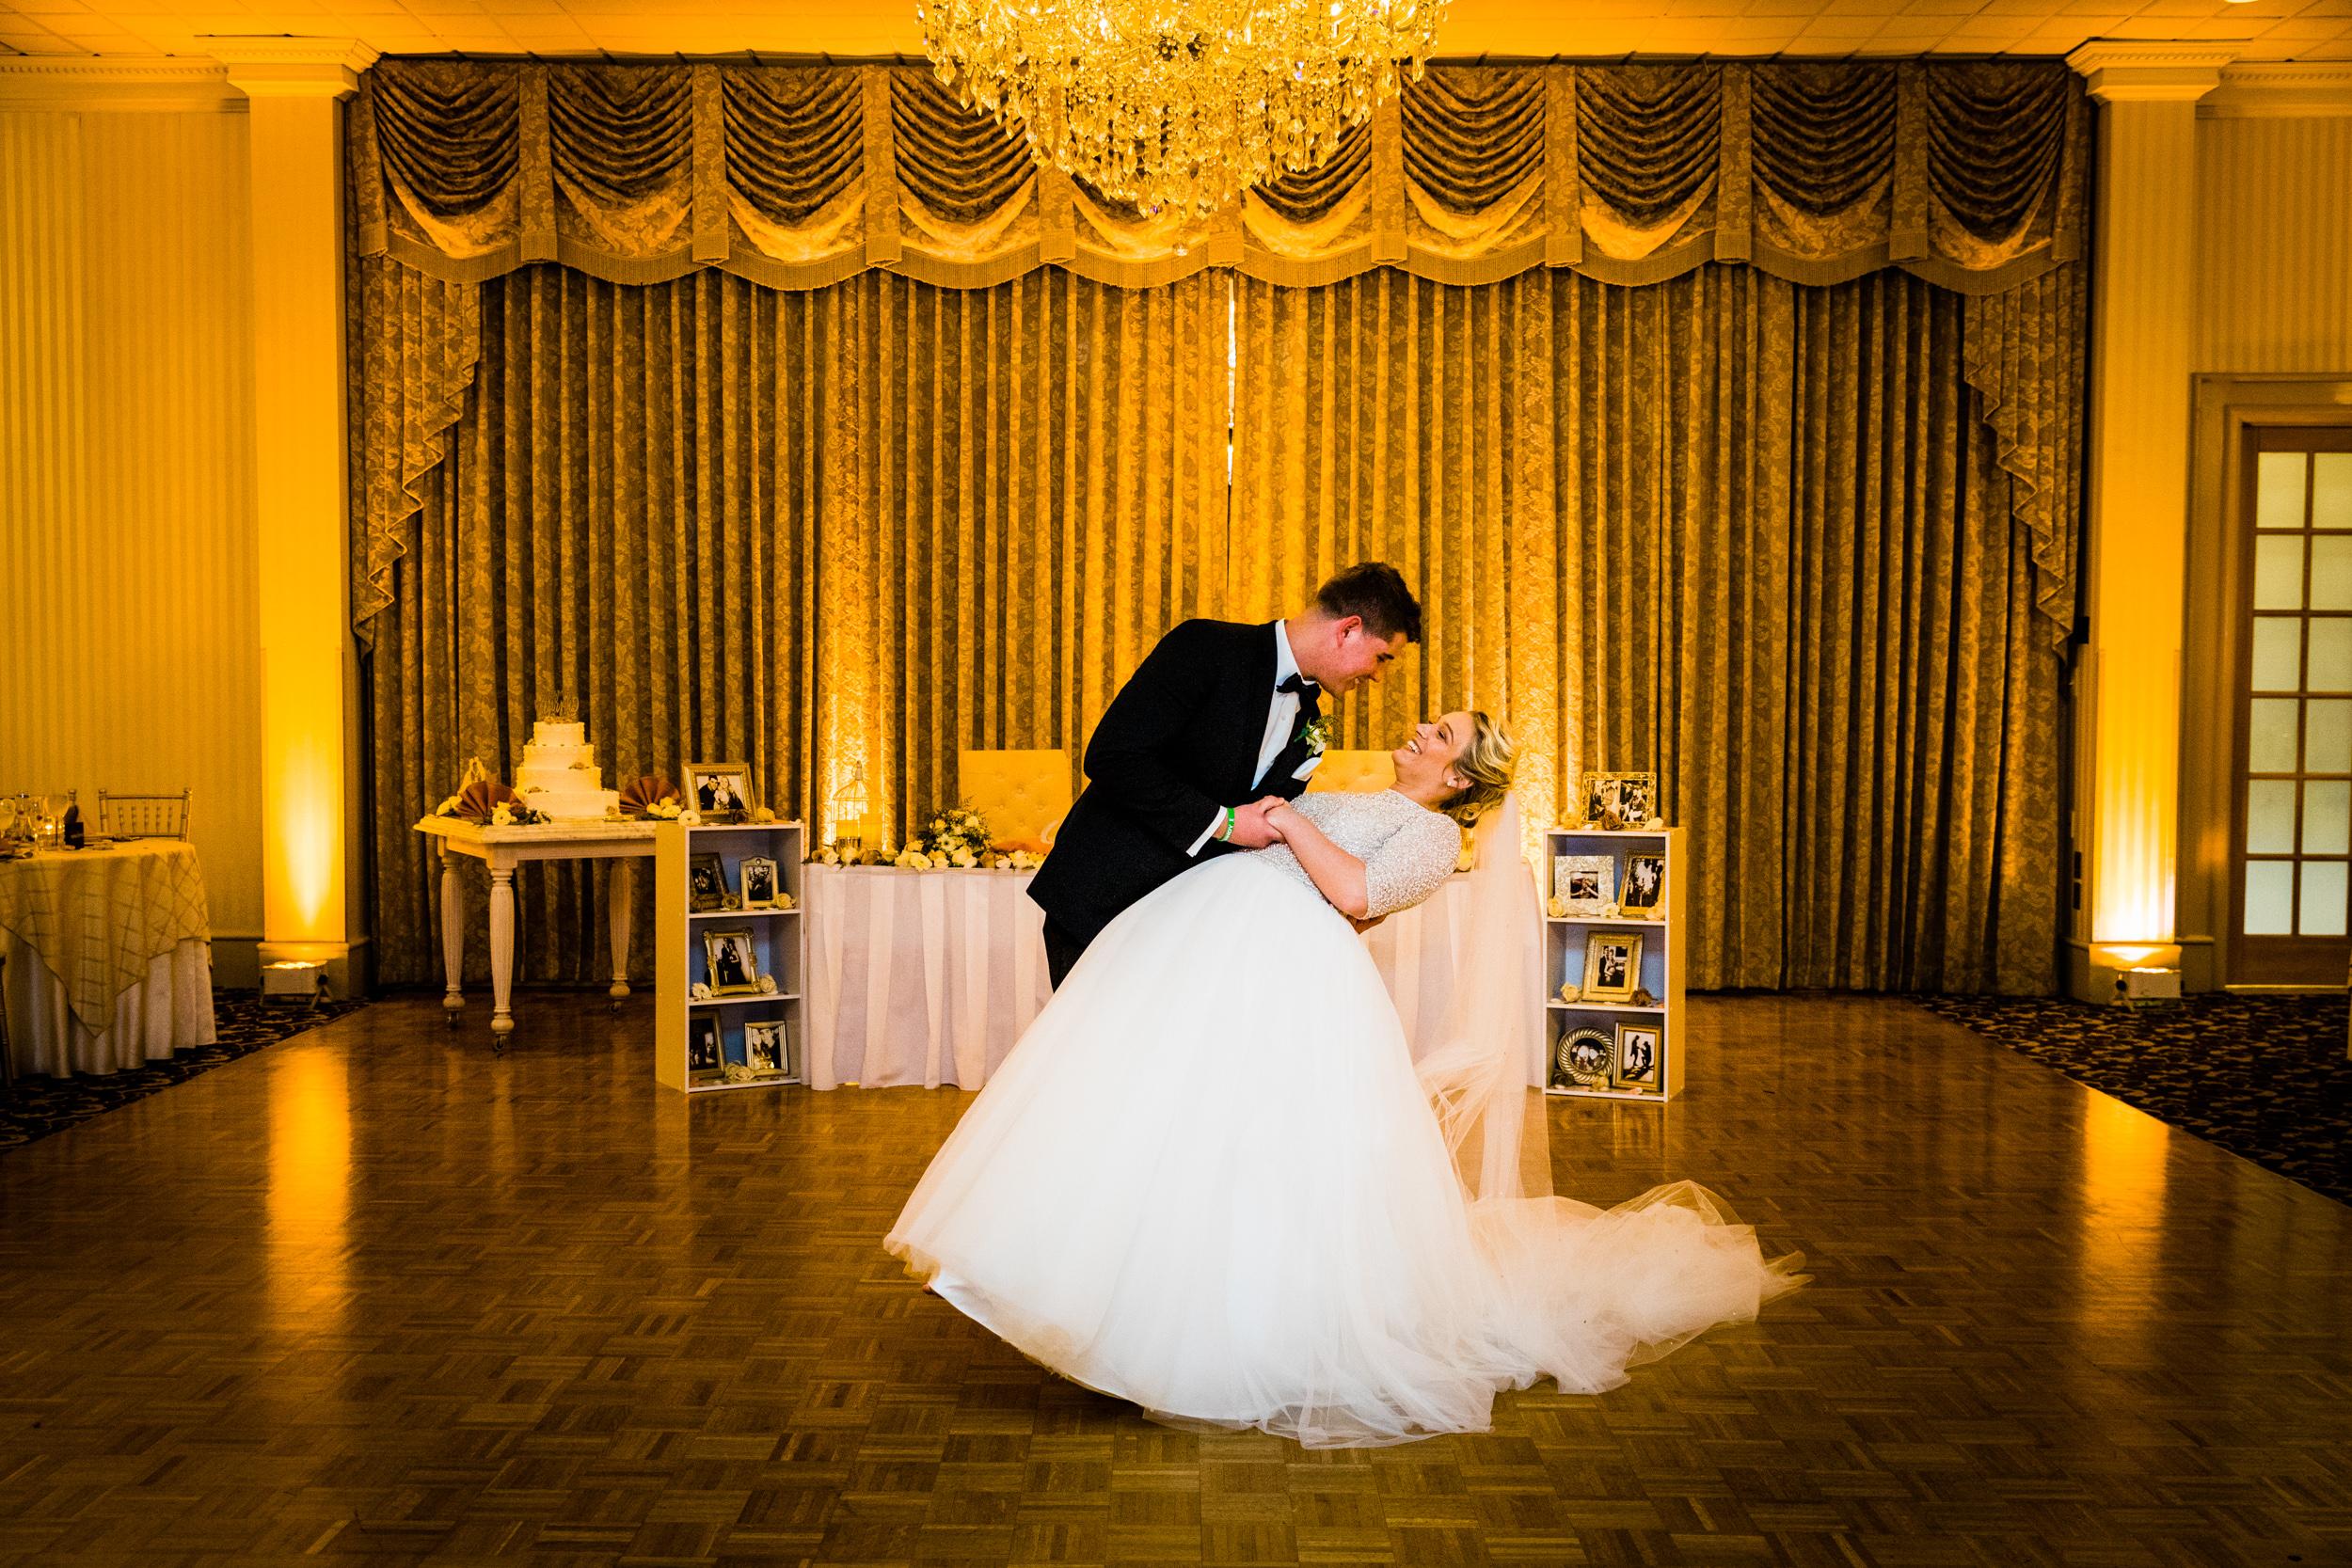 CELEBRATIONS BENSALEM WEDDING PHOTOGRAPHY-73.jpg